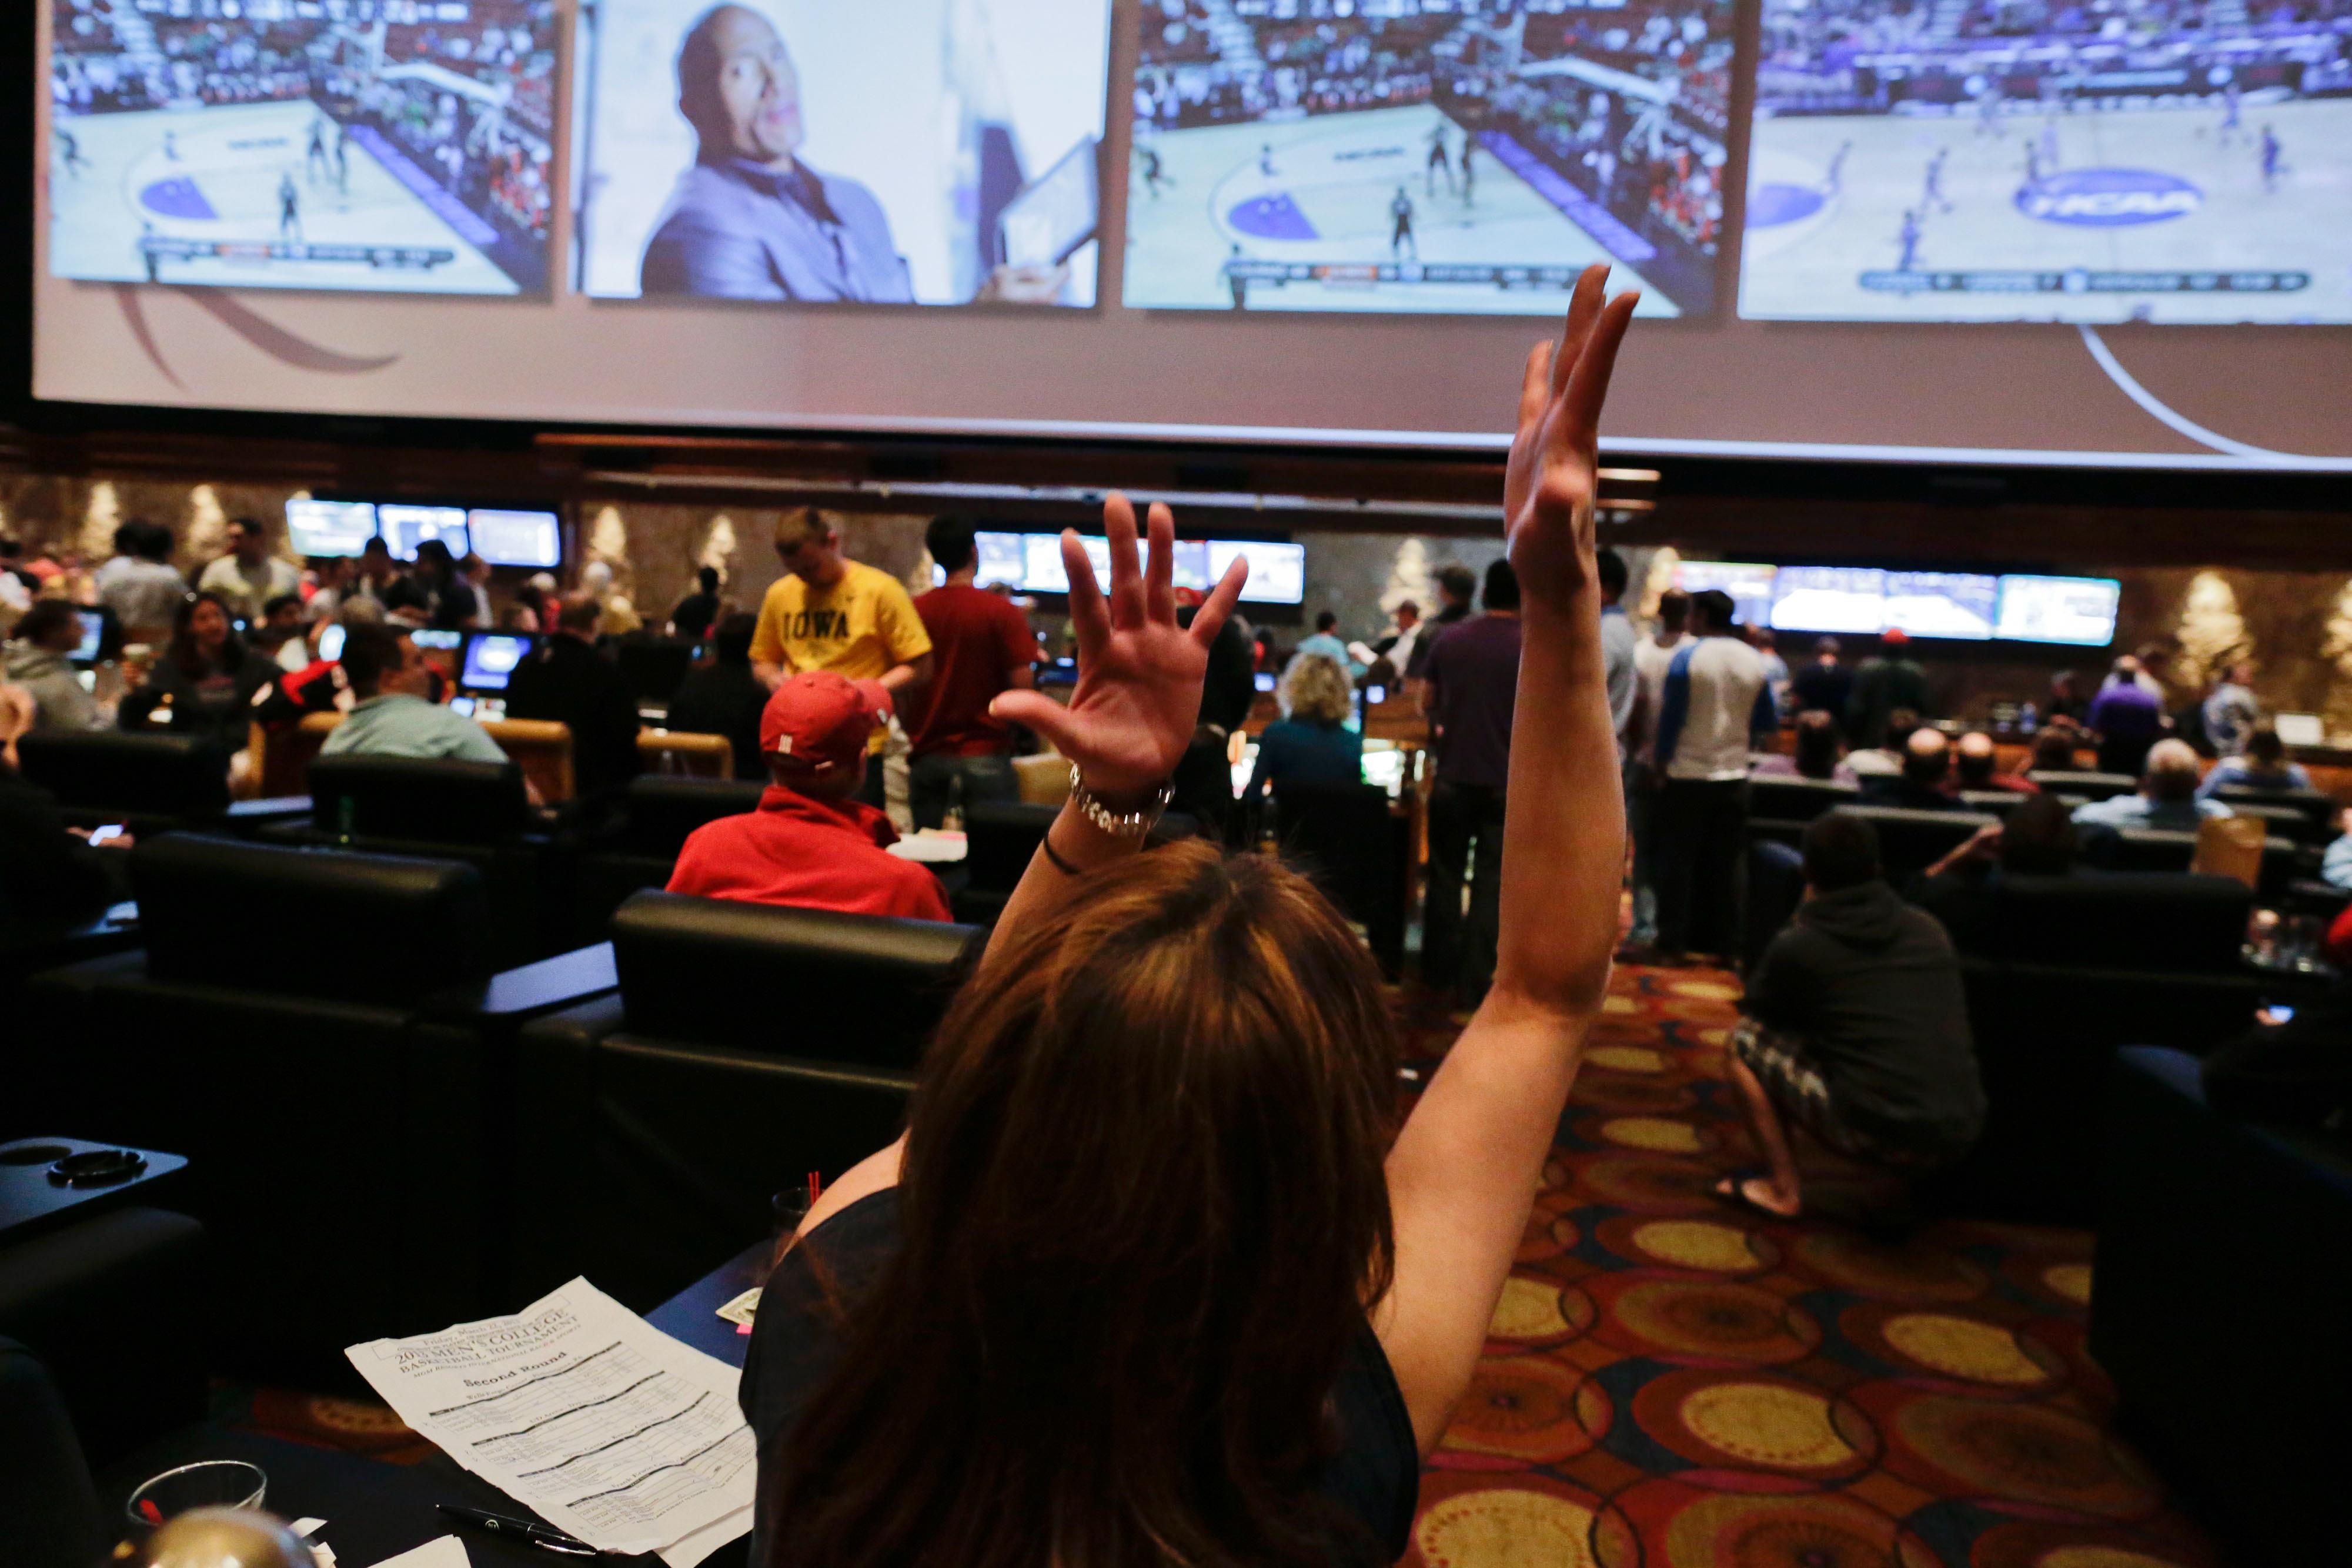 Mirage hotel-casino Race and Sports Book, Las Vegas.